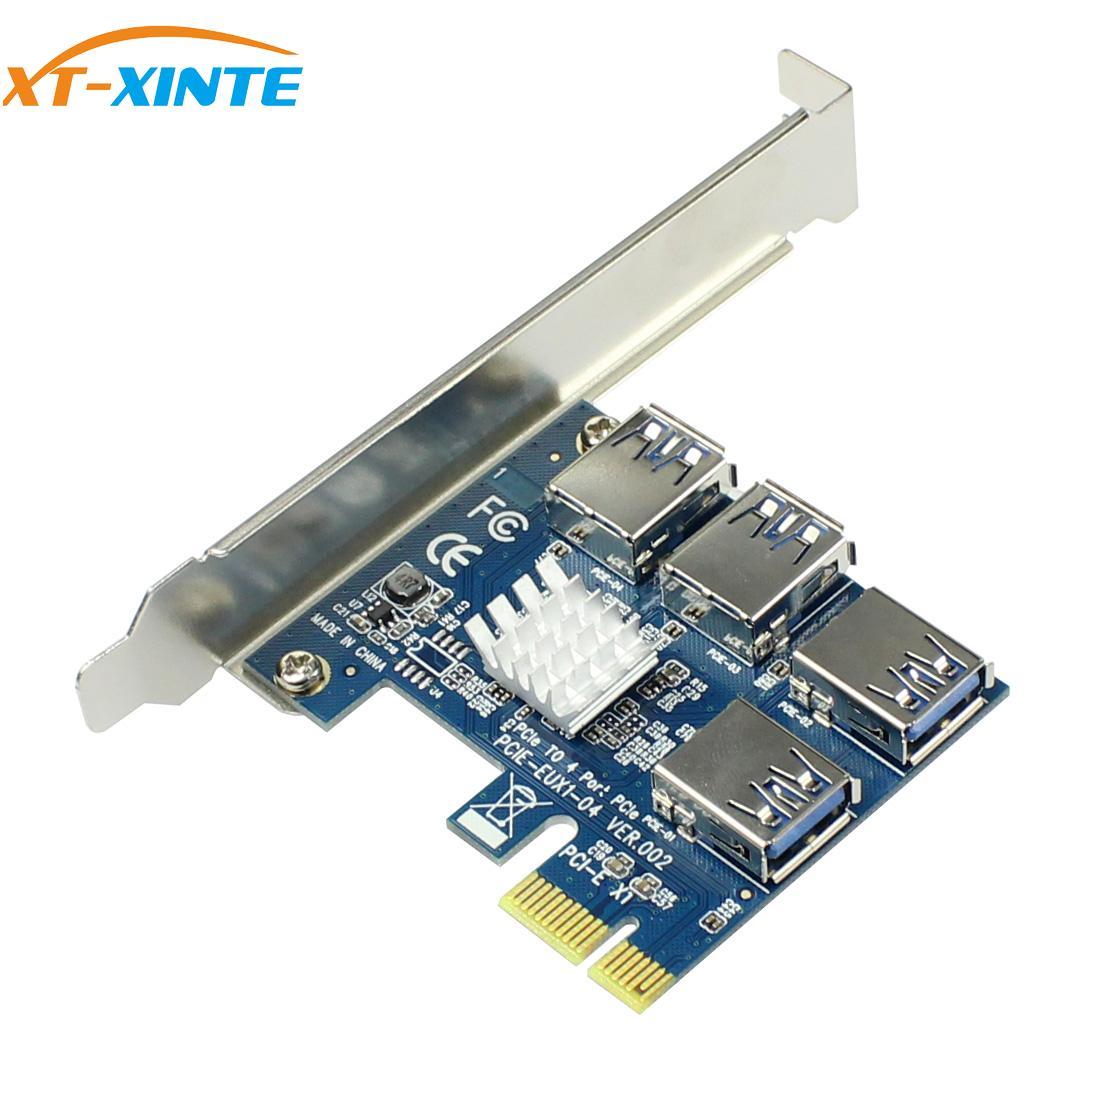 PCIe 1 до 4 PCI-express 16X слоты, Райзер-карта PCI-E 1X к внешнему 4 PCI-e USB 3,0, адаптер, карта-усилитель для майнинга биткоинов